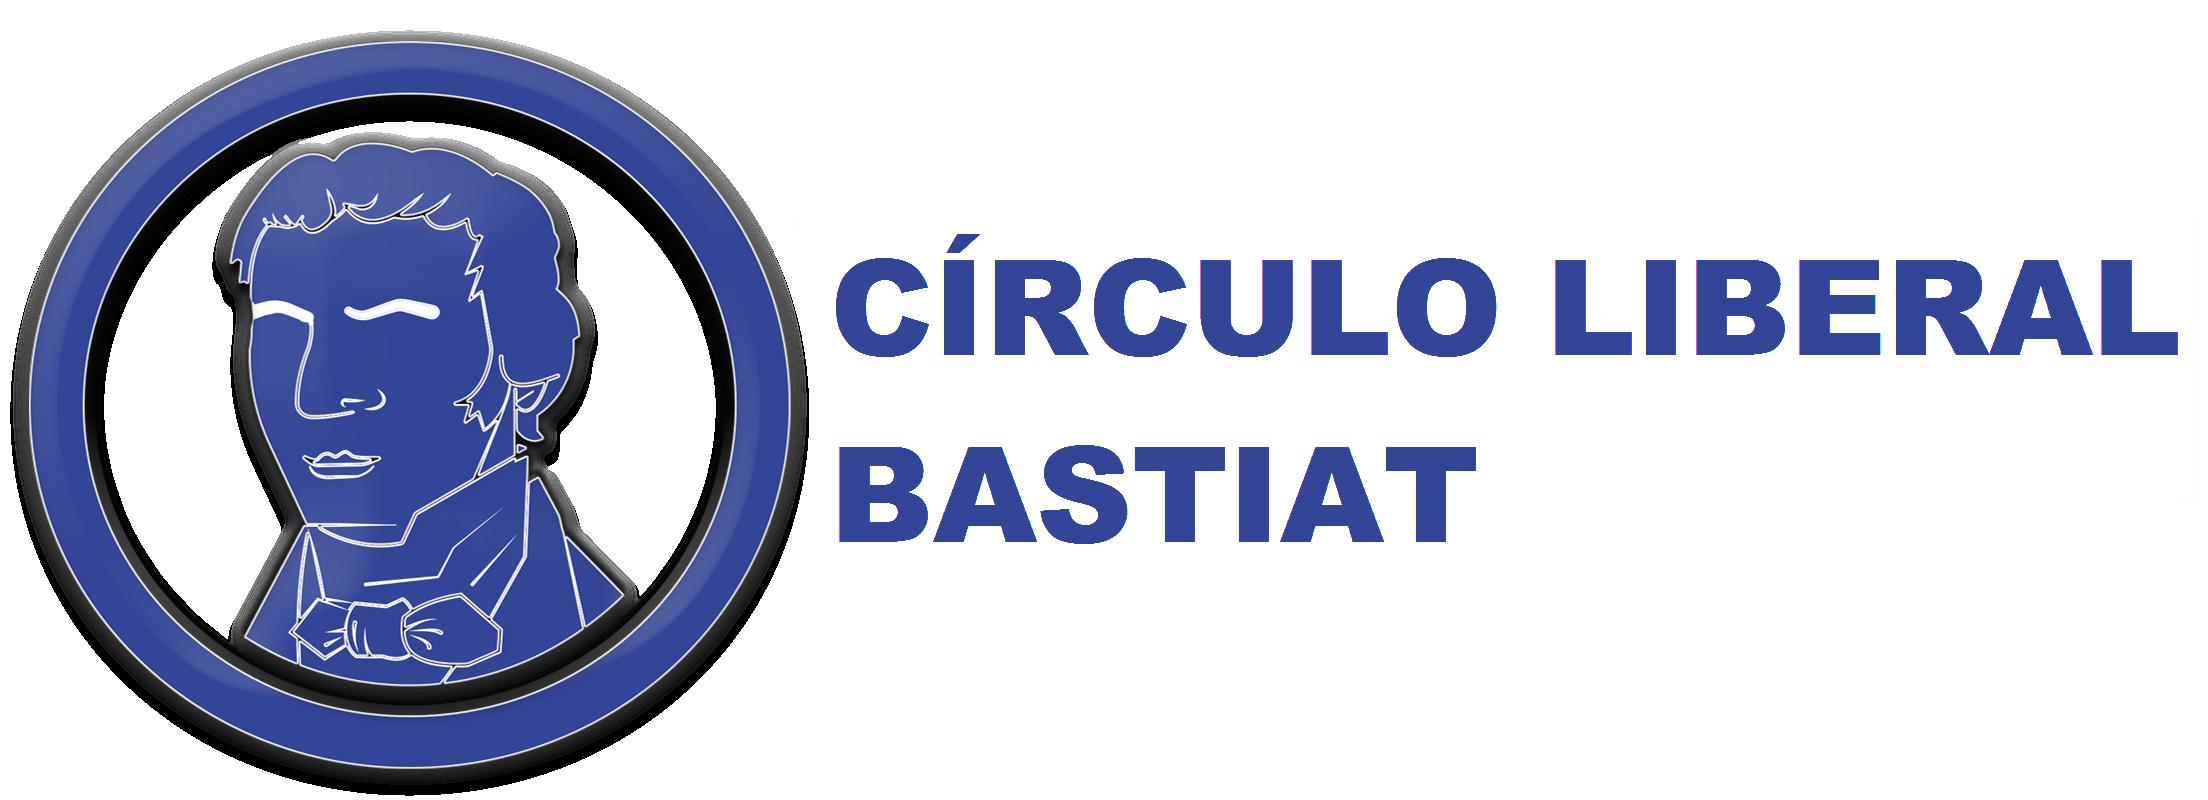 Circulo Liberal Bastiat